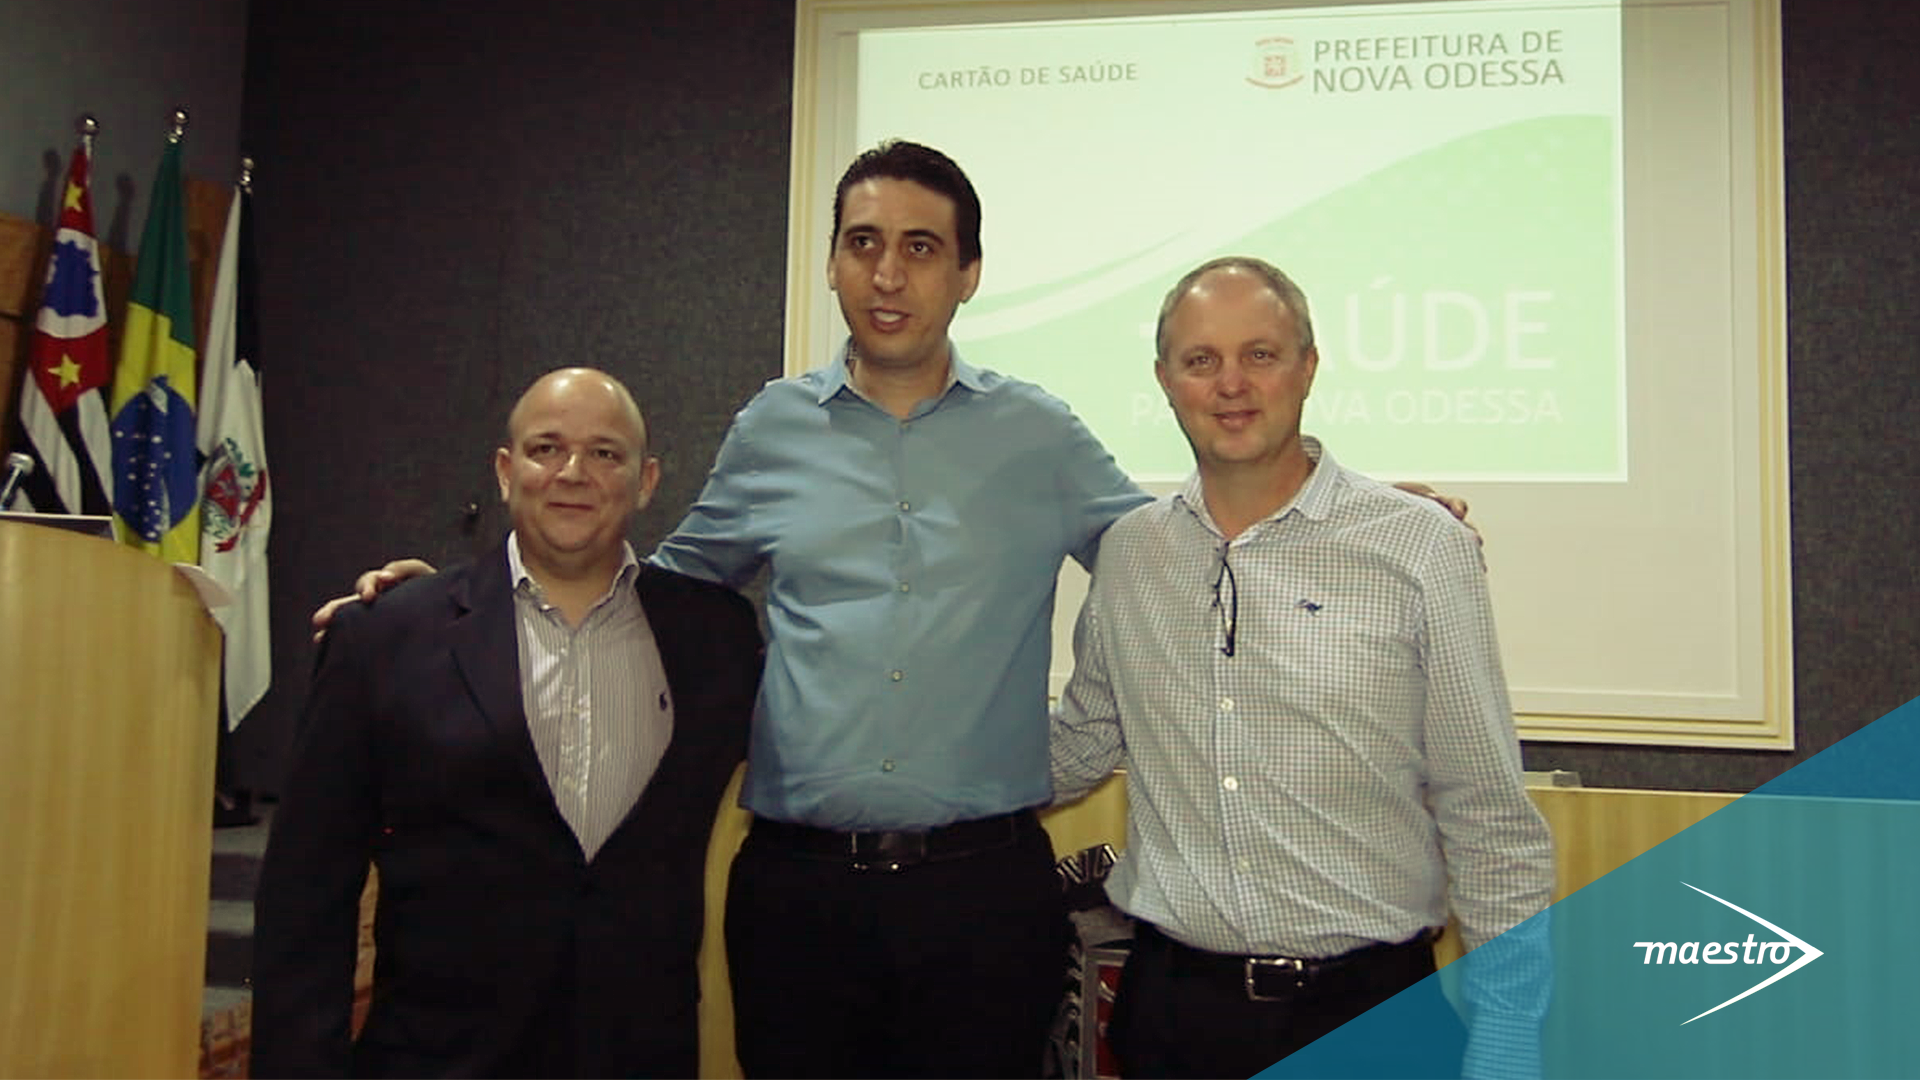 Foto: Glaucius Correa (Maestro), Vanderlei Cocato (Secretário de Saúde de Nova Odessa) e Wilian Josué (Maestro)